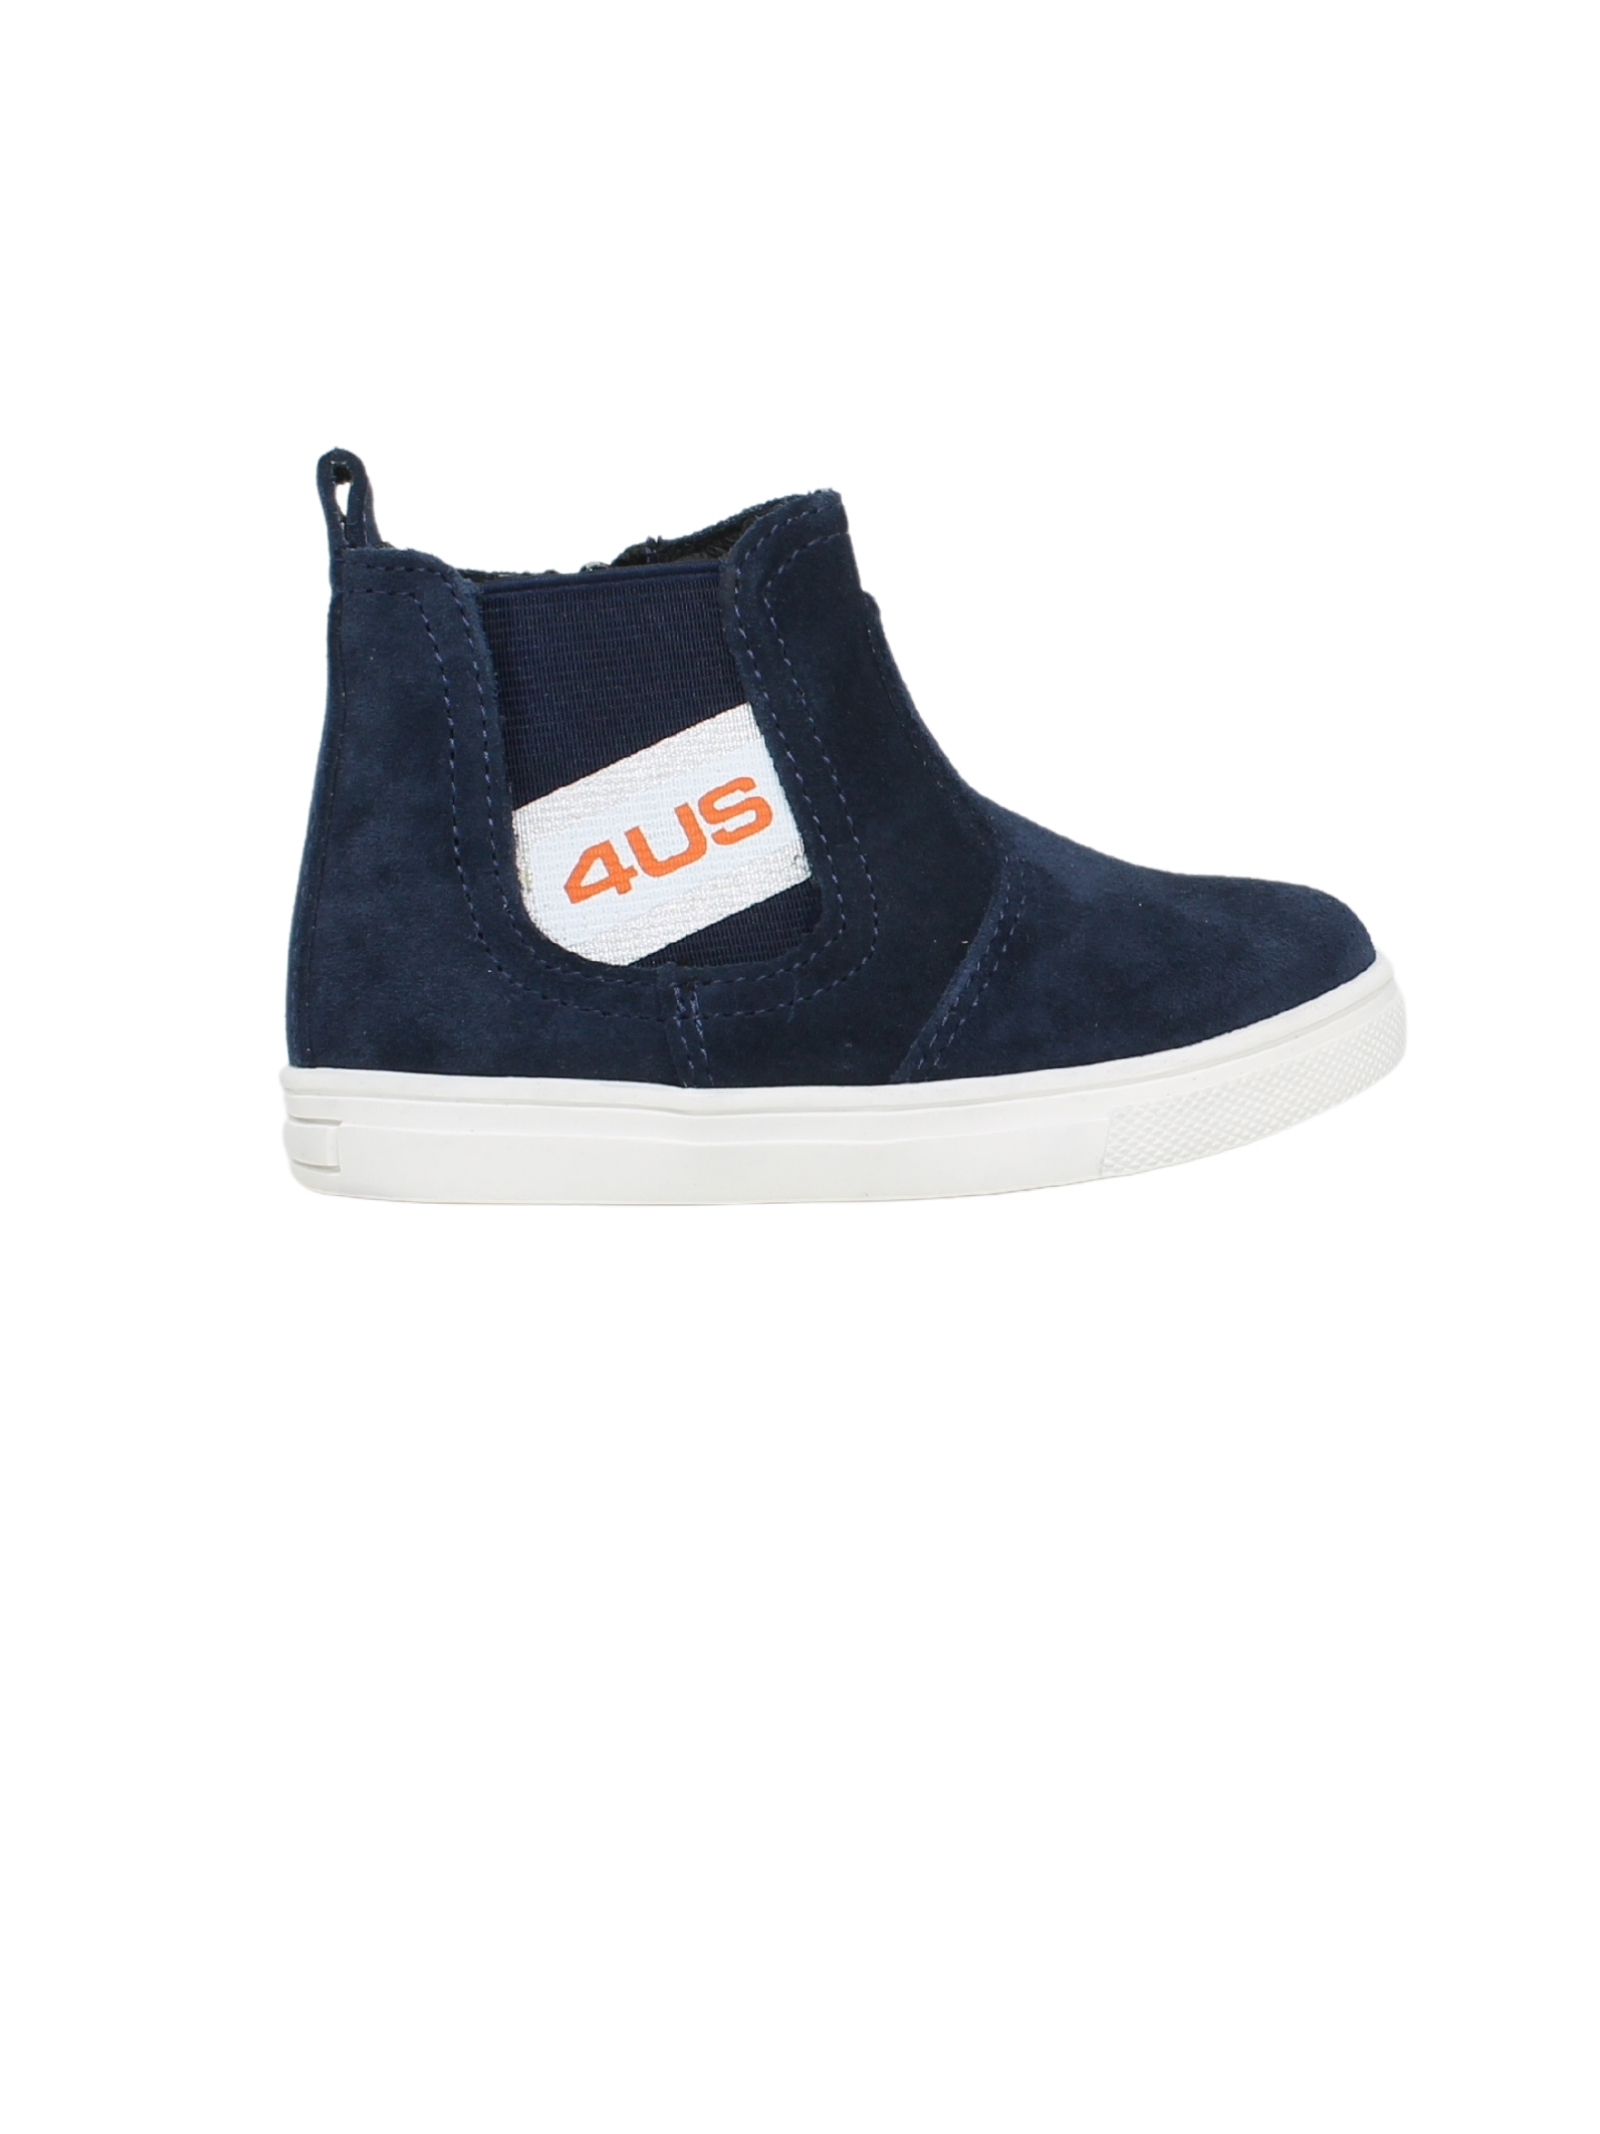 Blue Child ankle boots CESARE PACIOTTI | Desert boots | 4U140BLU